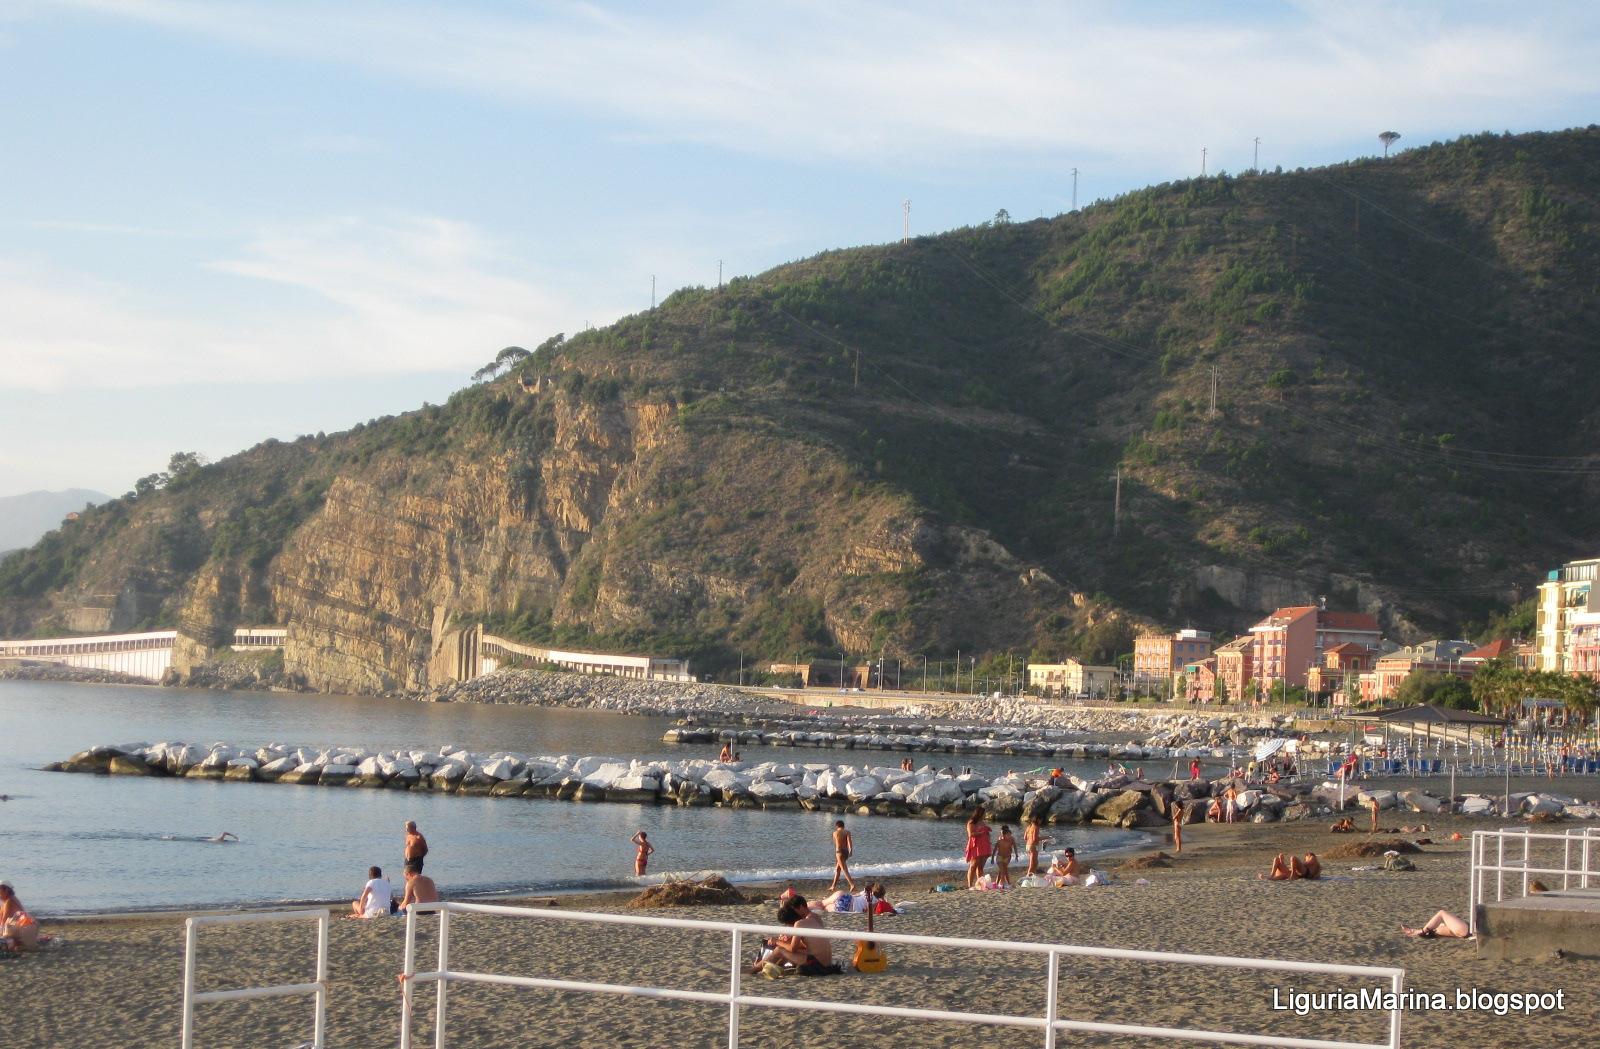 Matrimonio Spiaggia Sestri Levante : Liguriamarina sestri levante